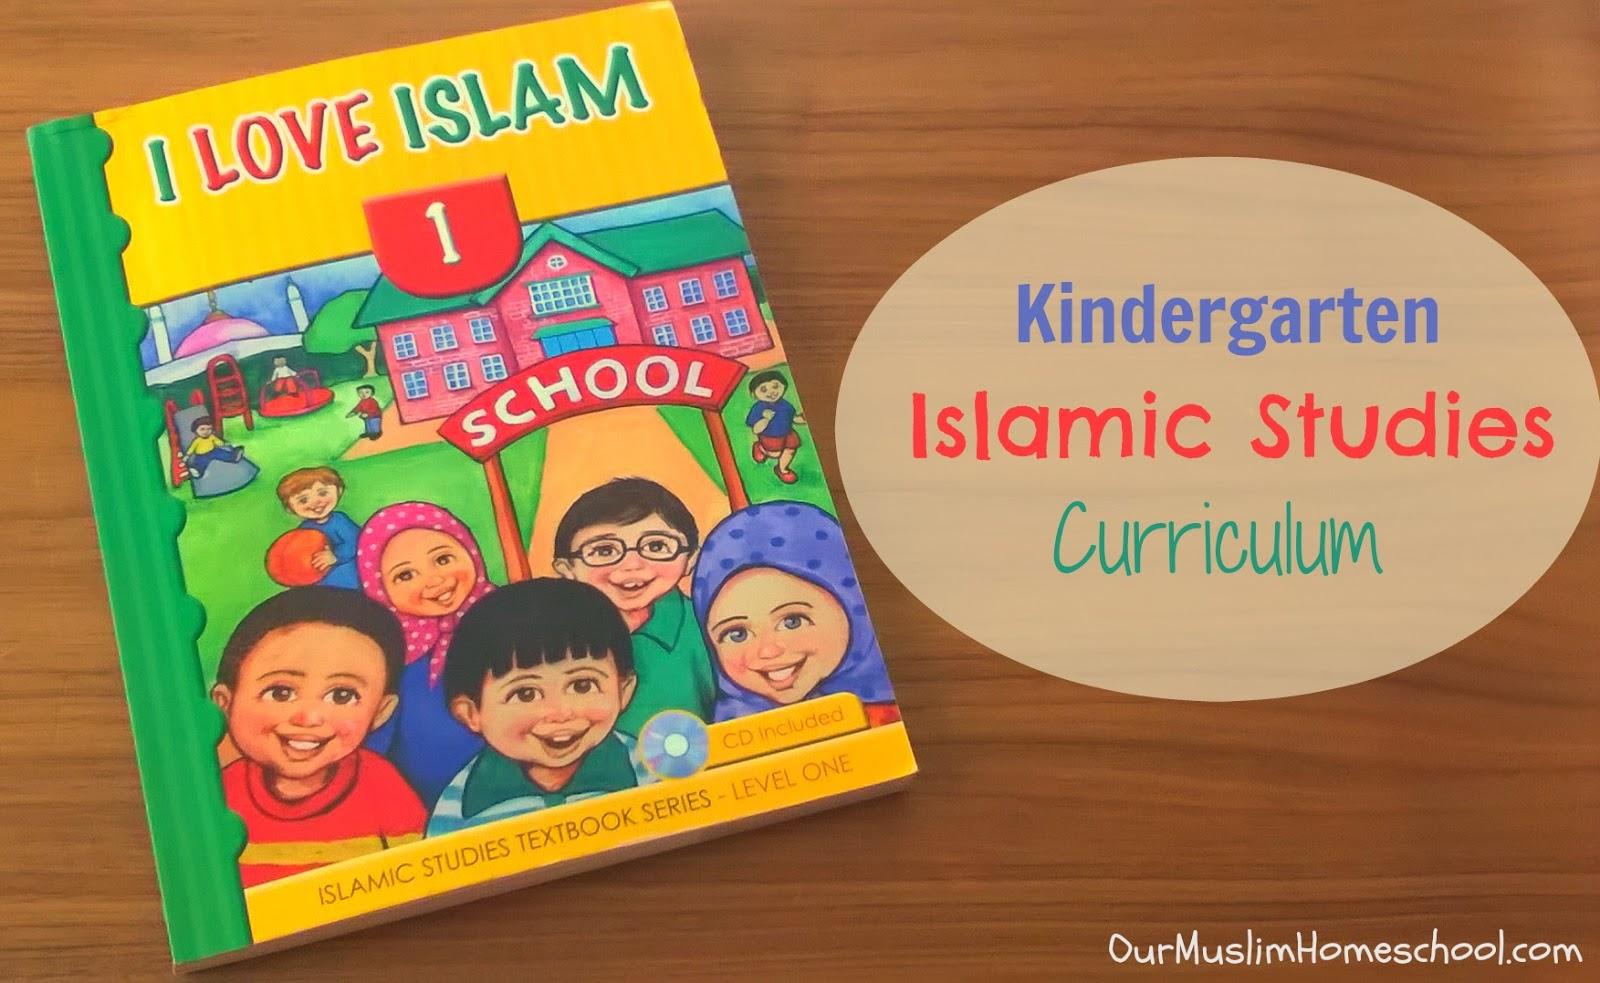 hight resolution of Kindergarten Islamic Studies Curriculum - Muslim Homeschooling Resources